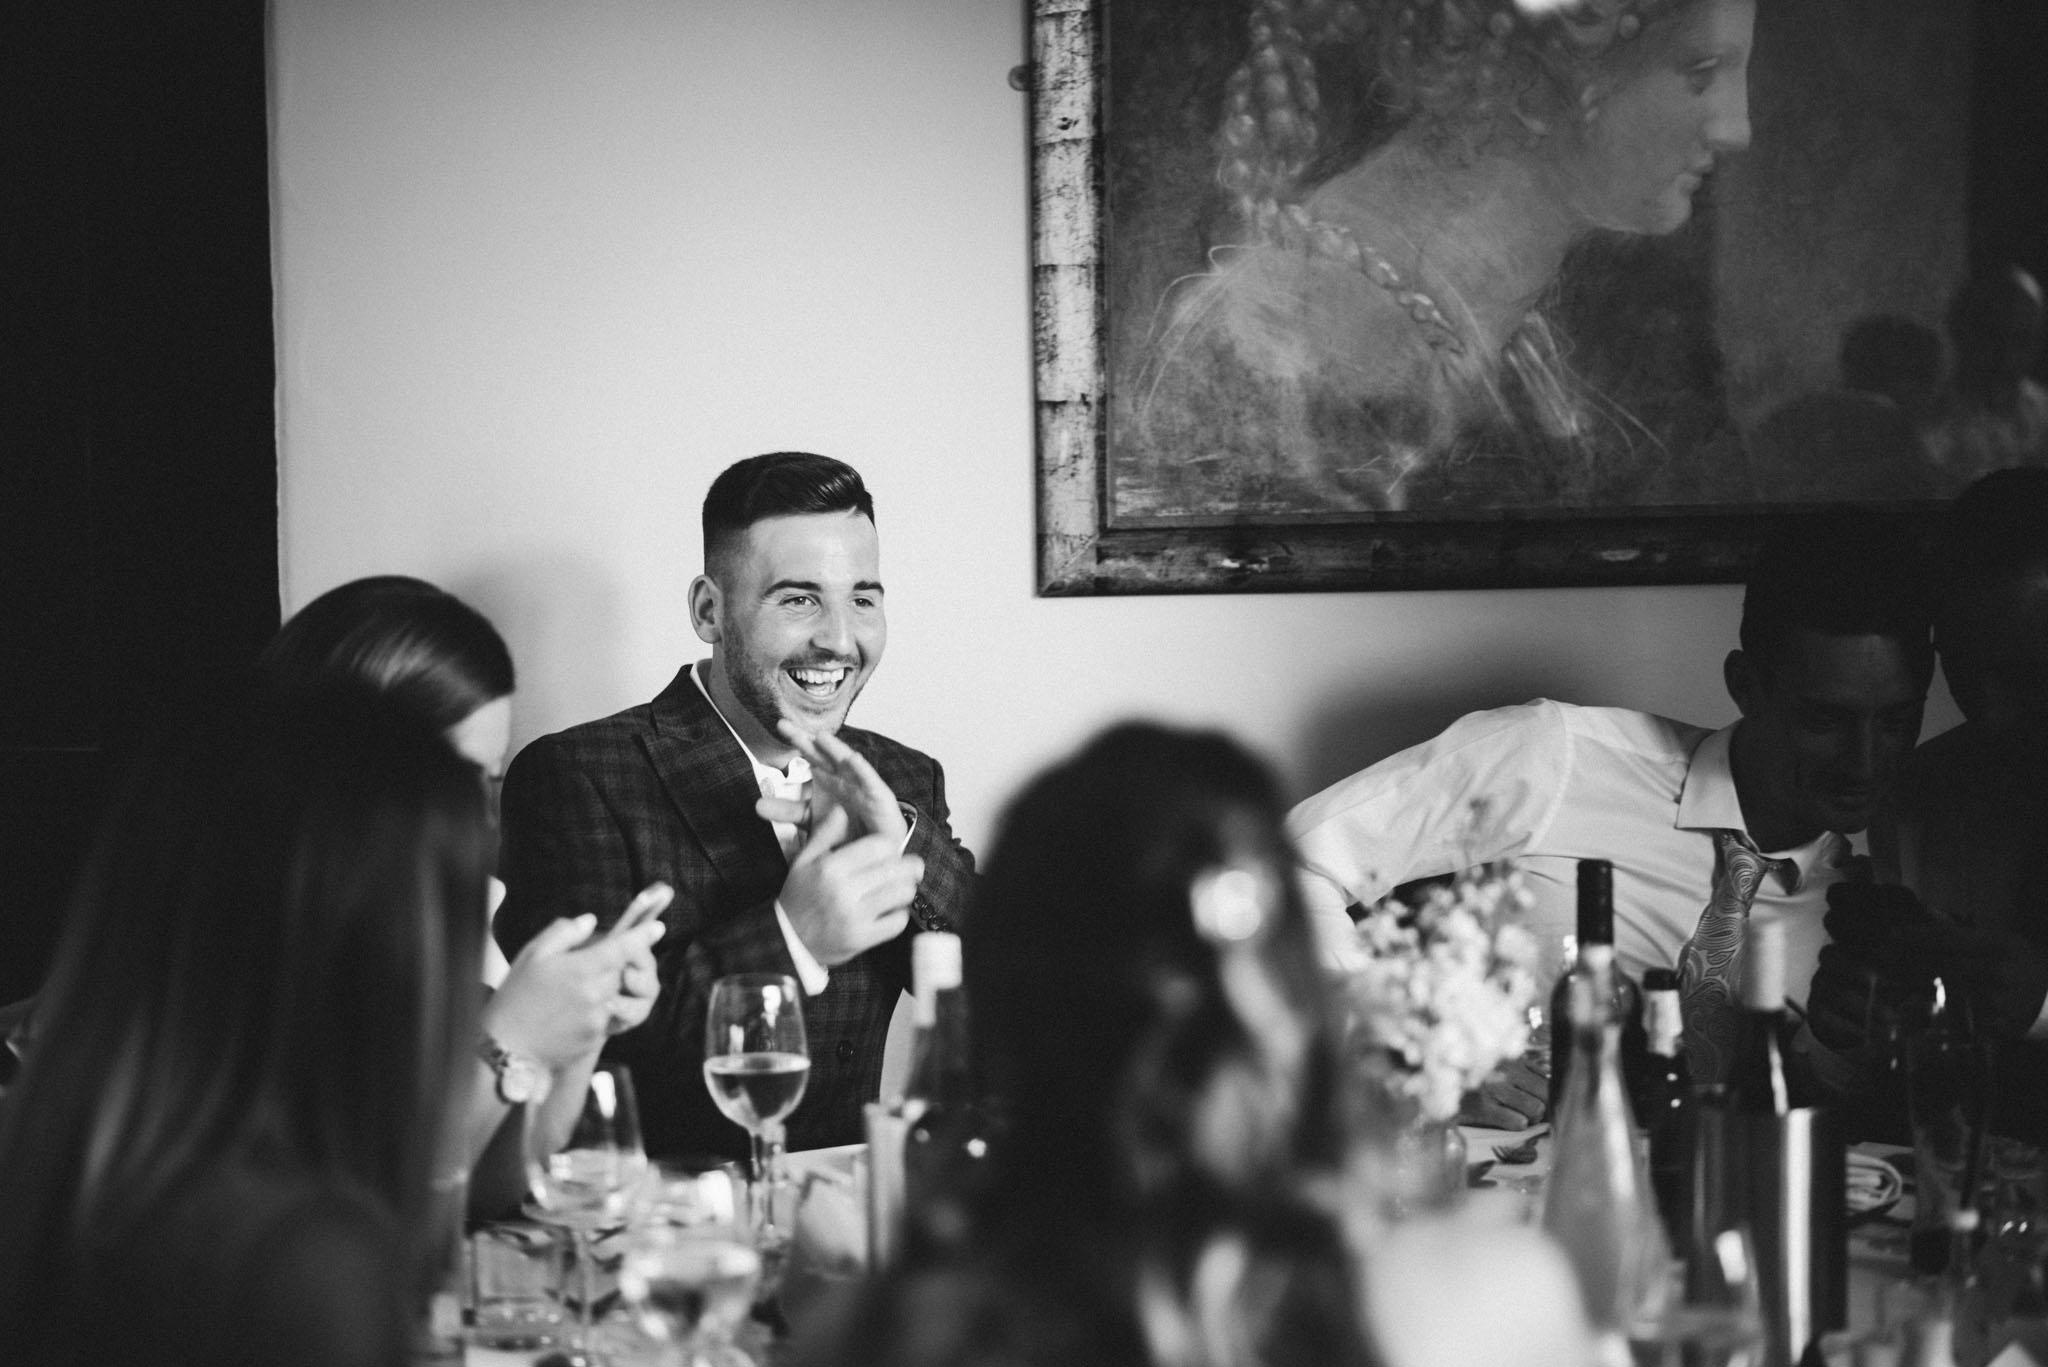 wedding-photographer-glewstone-court-hereford-scott-stockwell-photography383.jpg